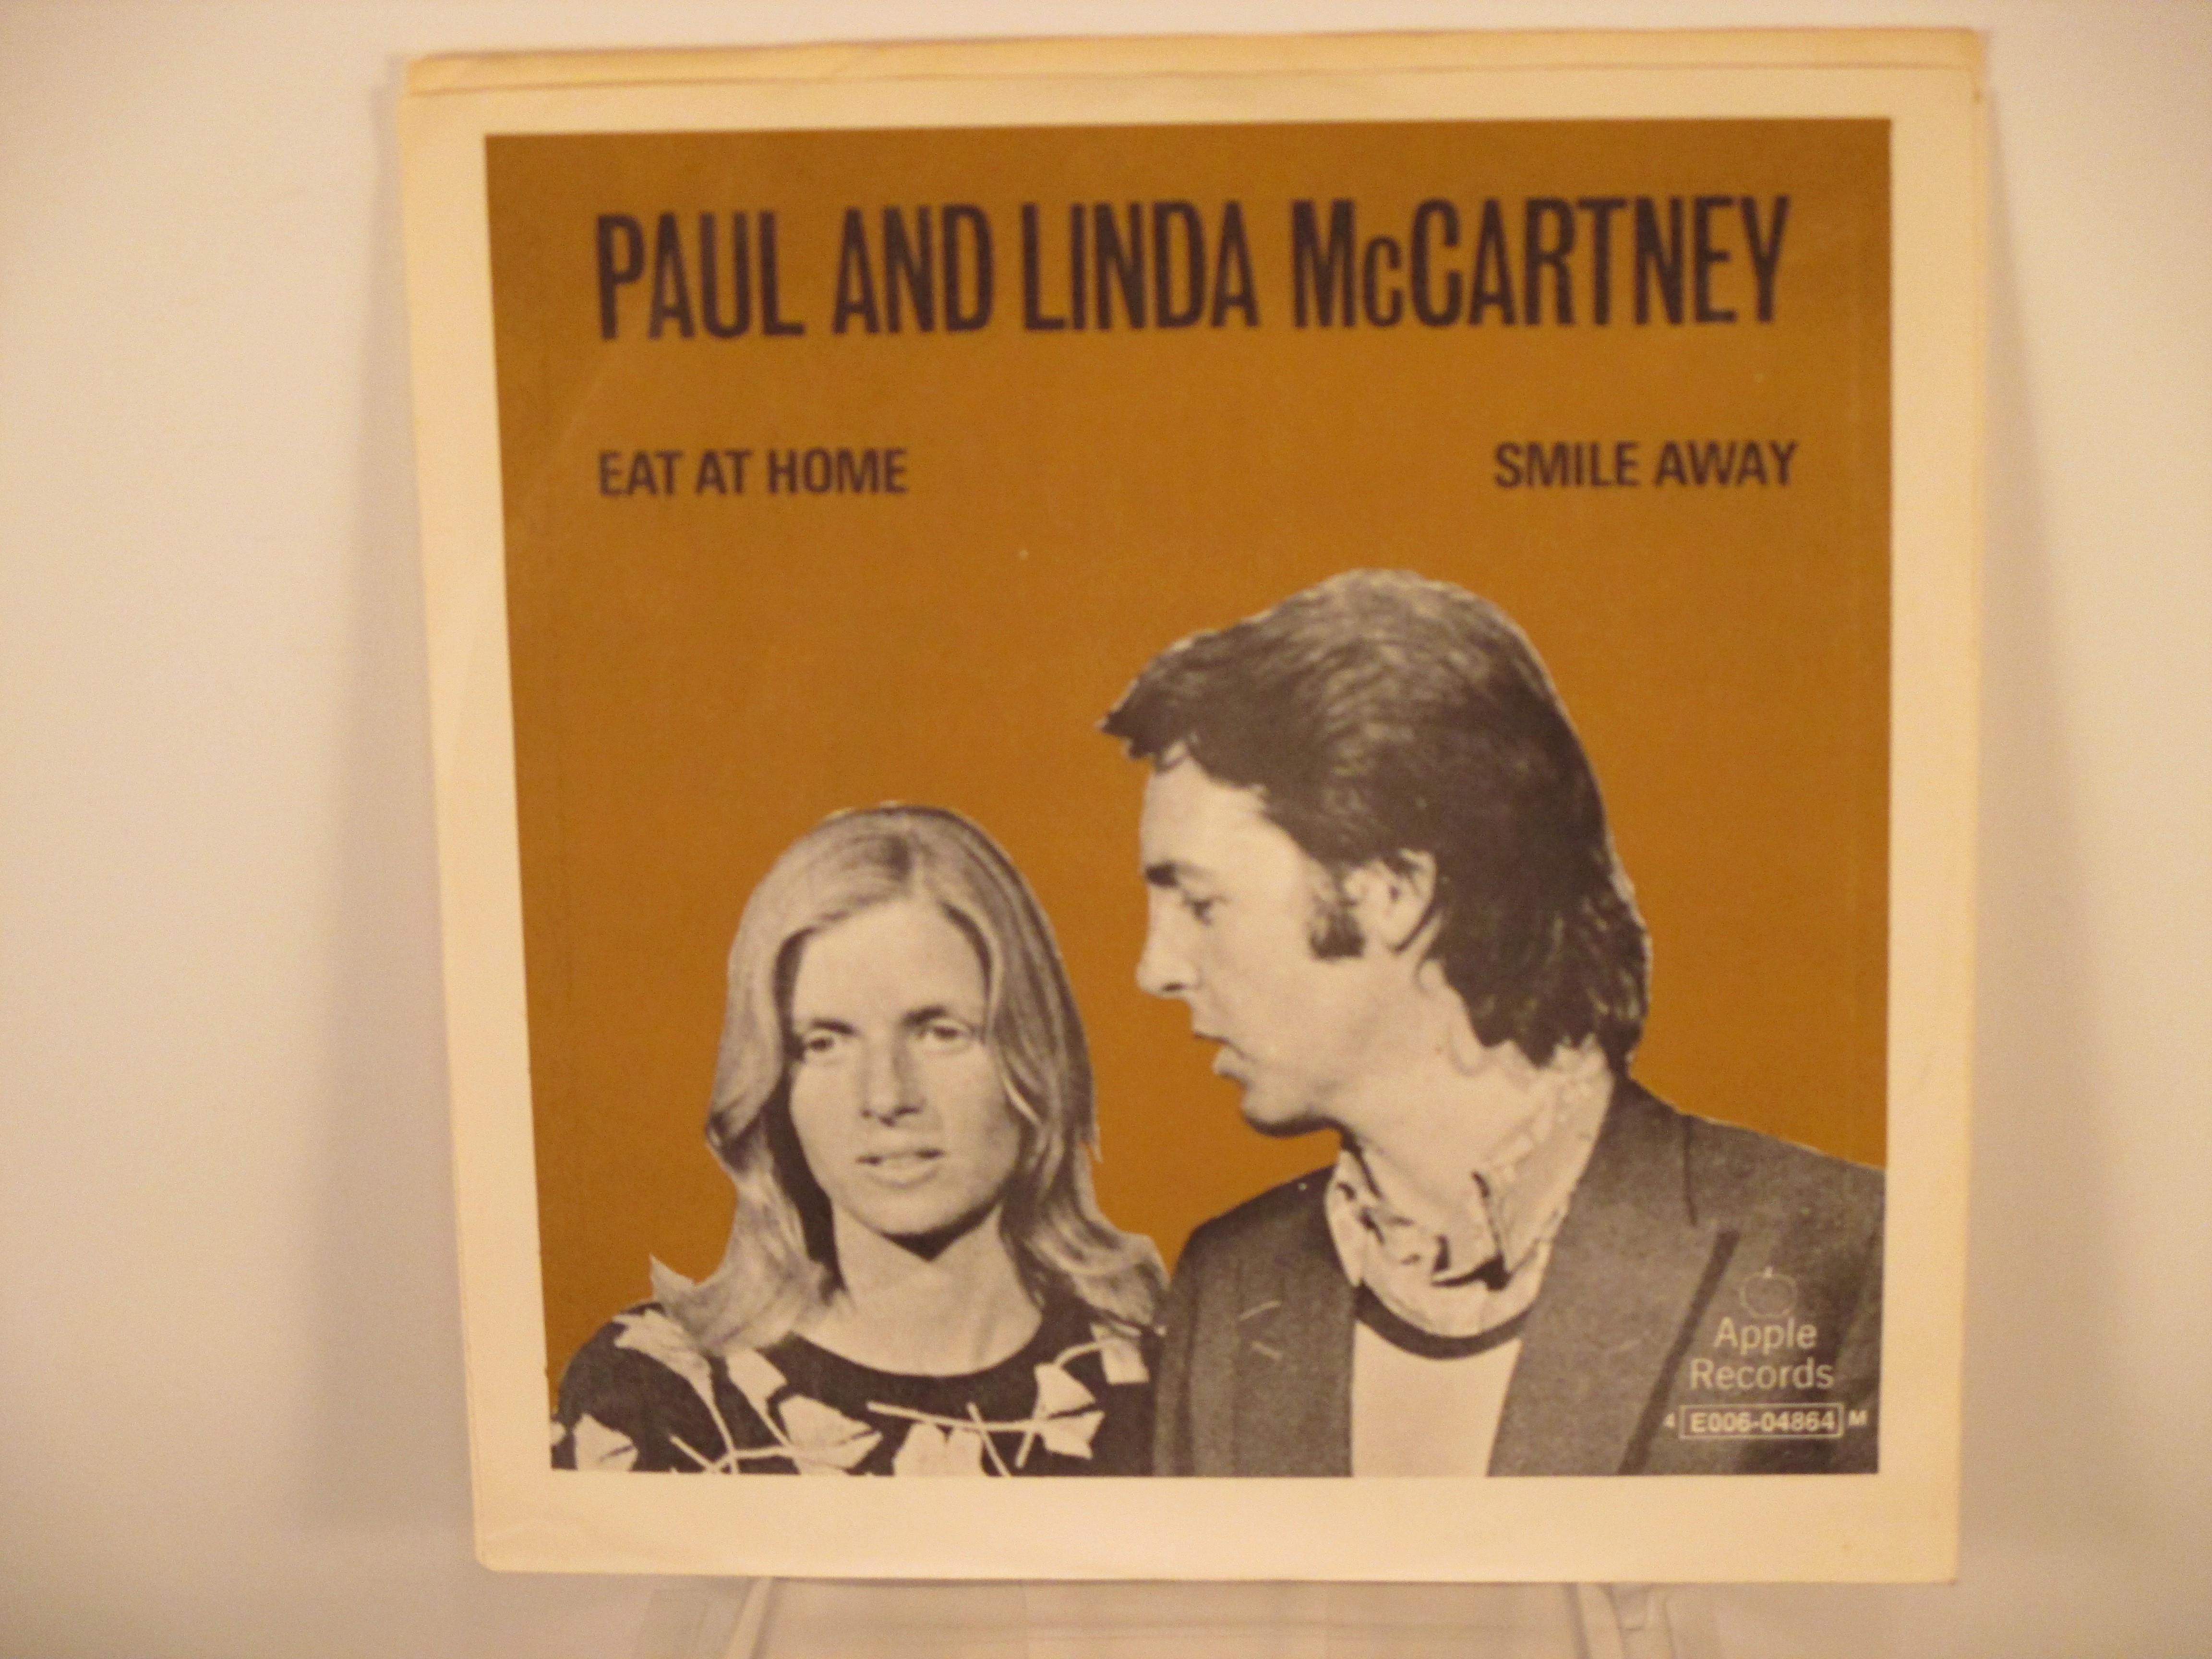 PAUL McCARTNEY : Eat at home / Smile away